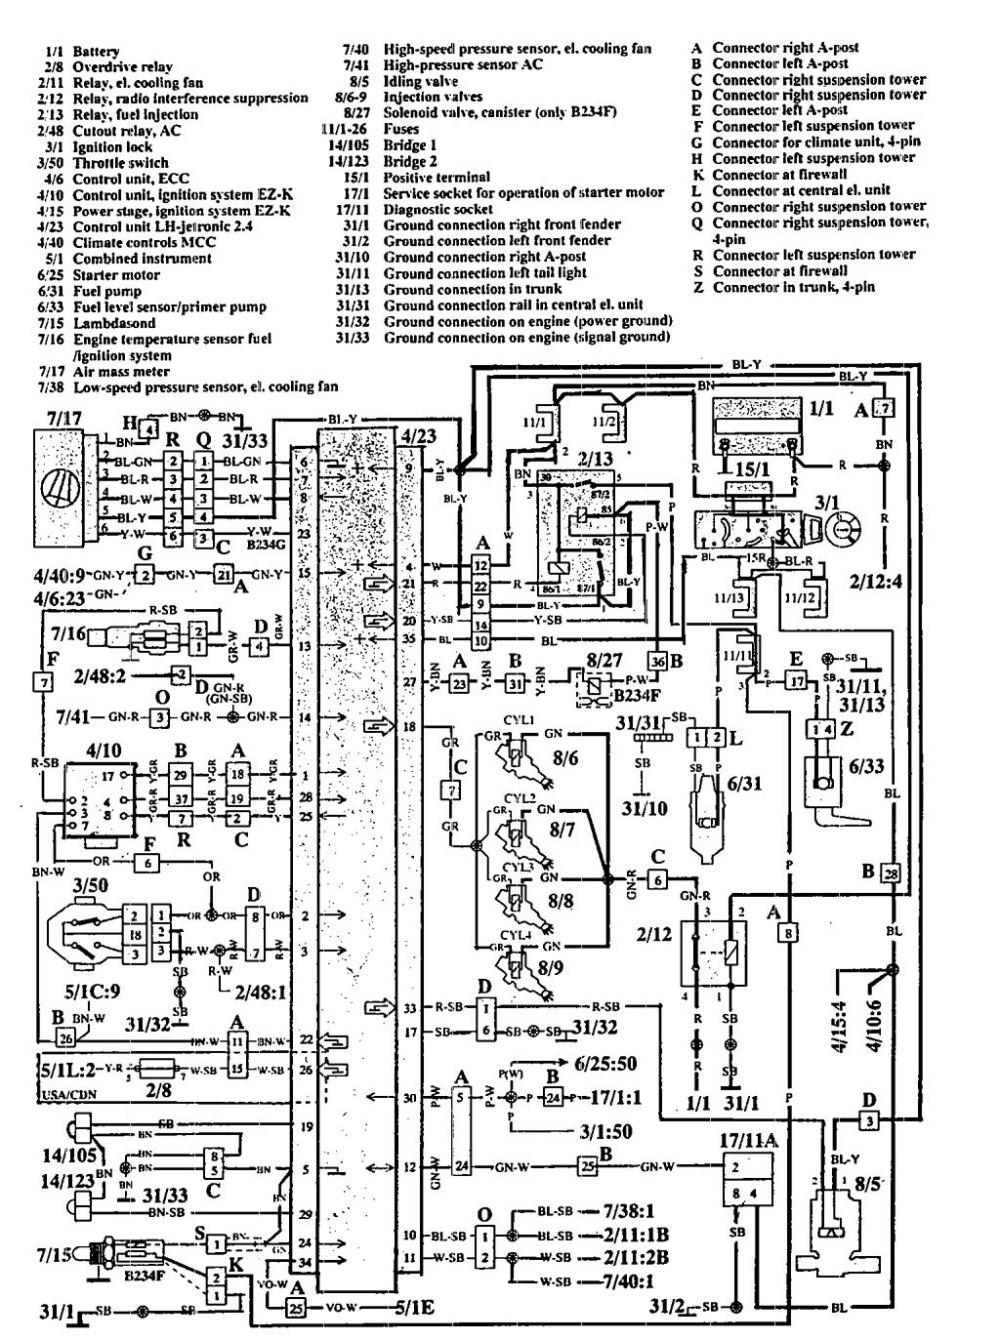 medium resolution of volvo 940 wiring diagram 1997 29 wiring diagram images volvo truck wiring schematic volvo vn wiring